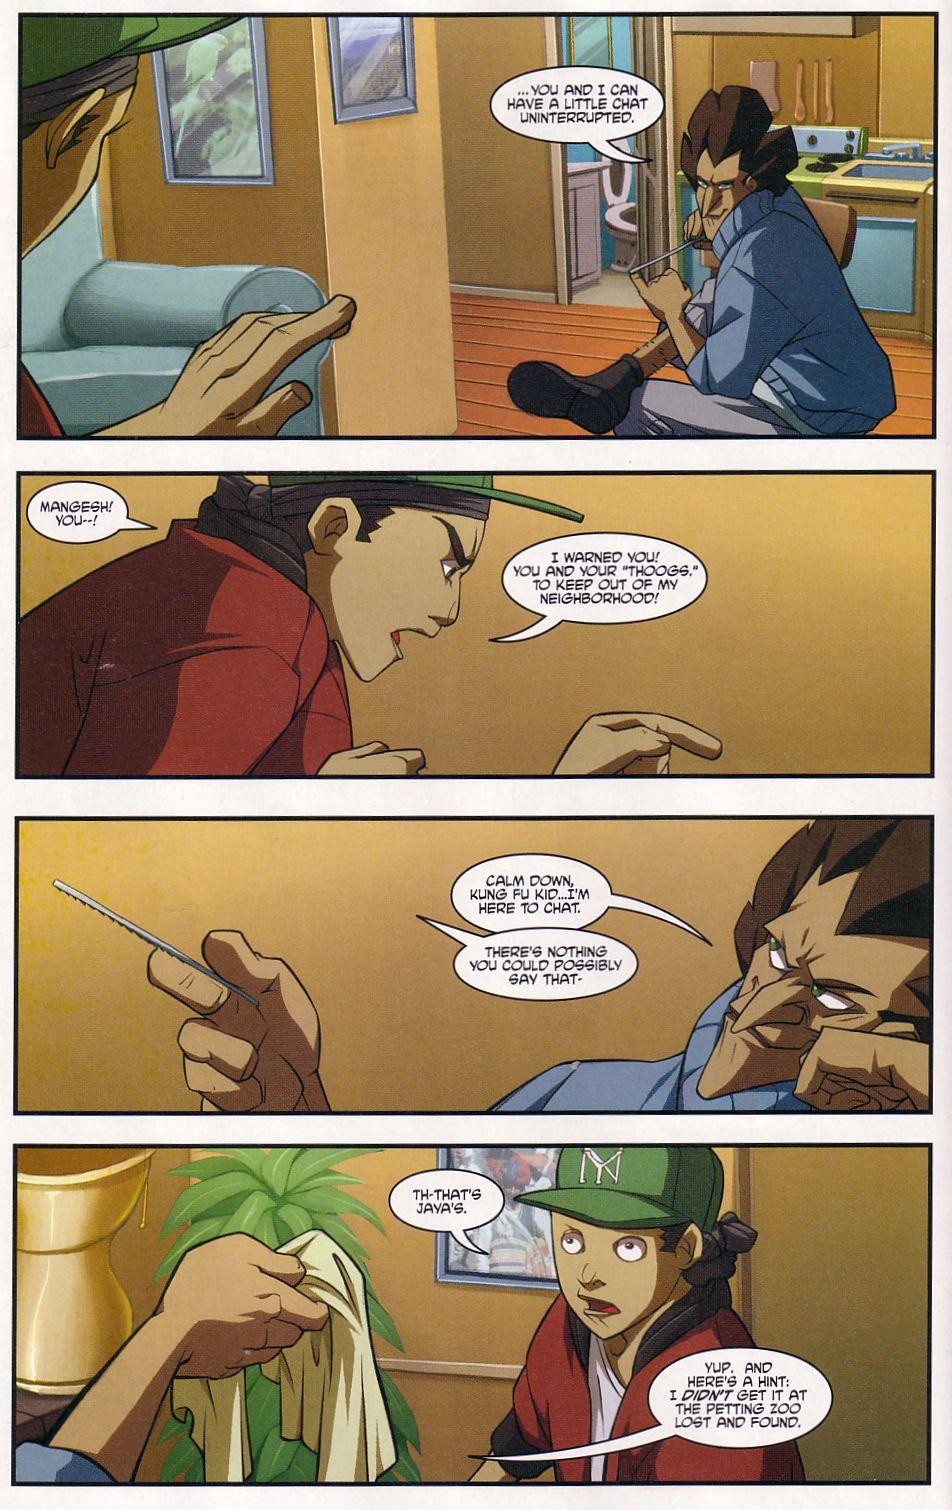 Teenage Mutant Ninja Turtles (2003) chap 7 pic 12